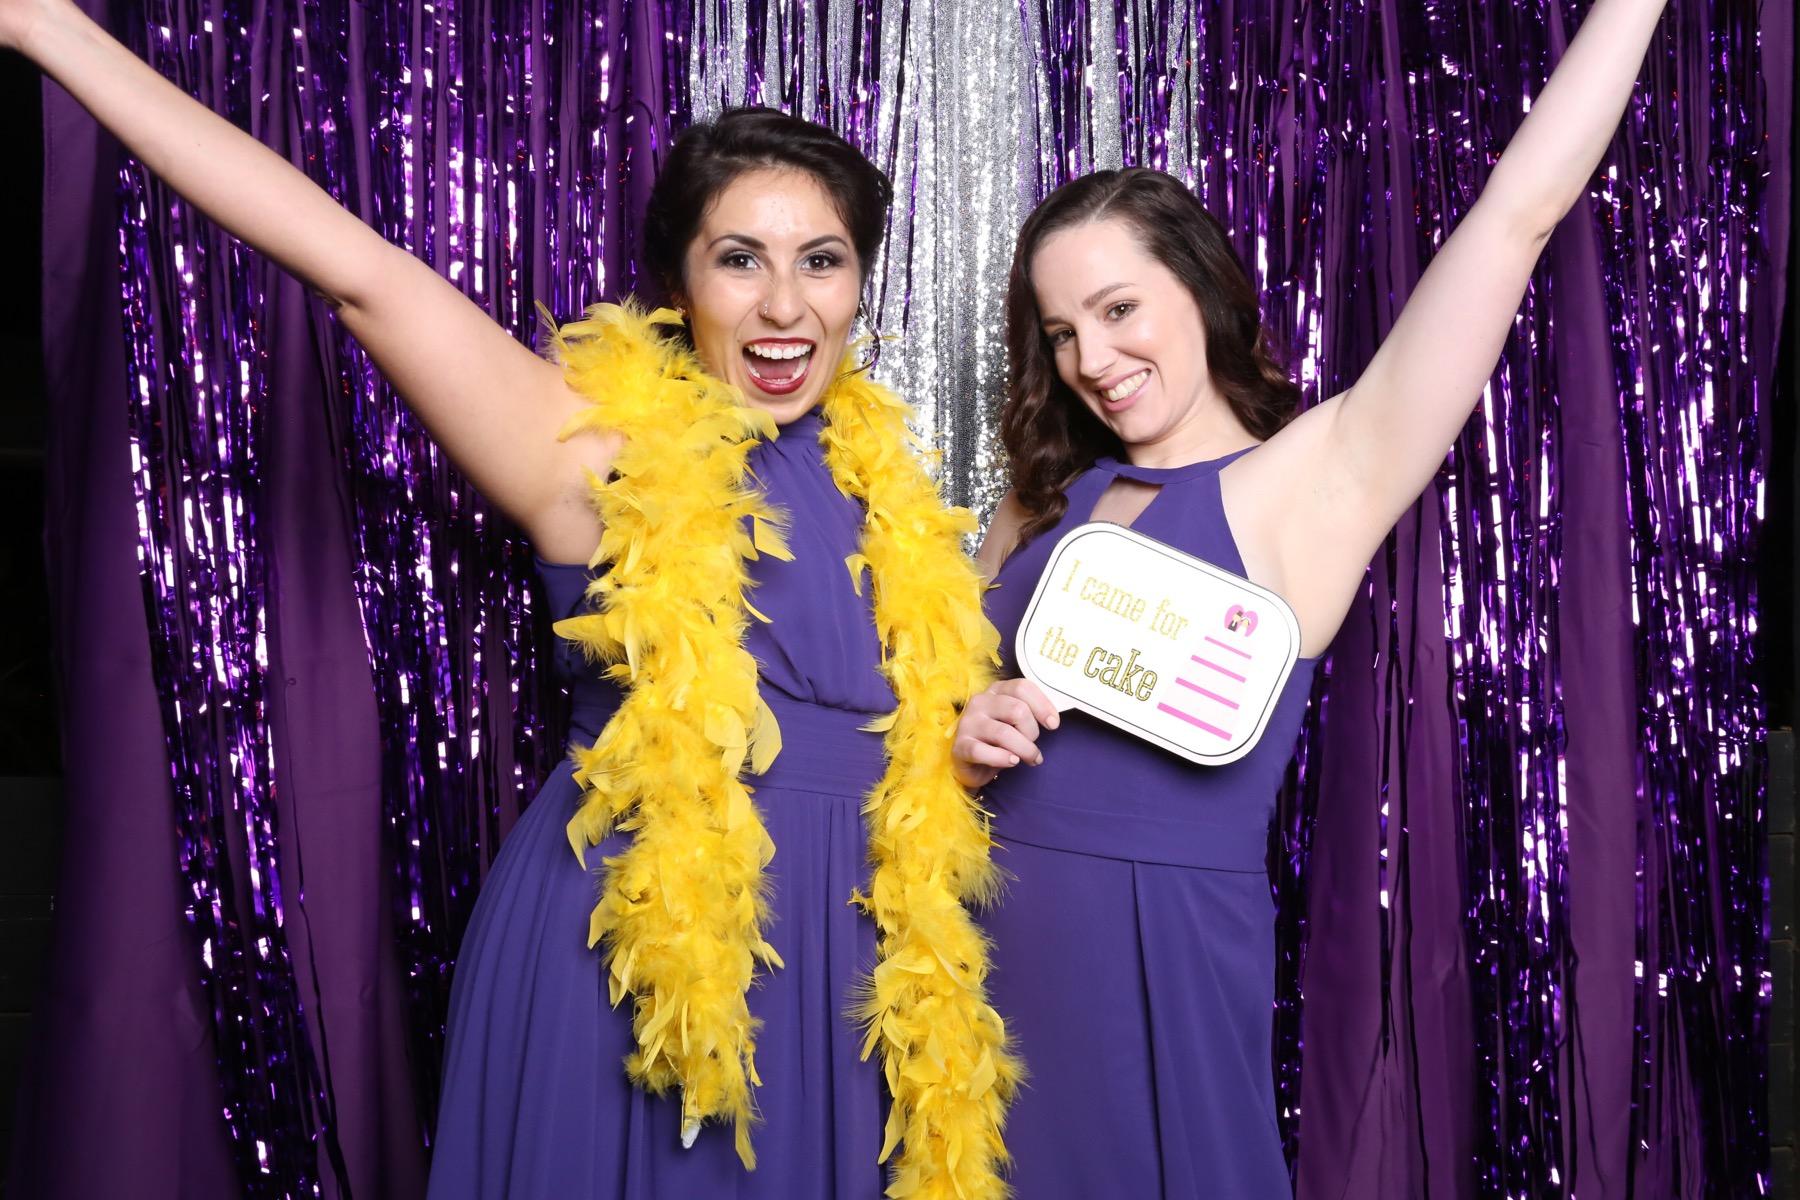 Booth Chamber Photo Booth Harmony Gardens wedding antoine Hart de leon springs photography_18.jpeg